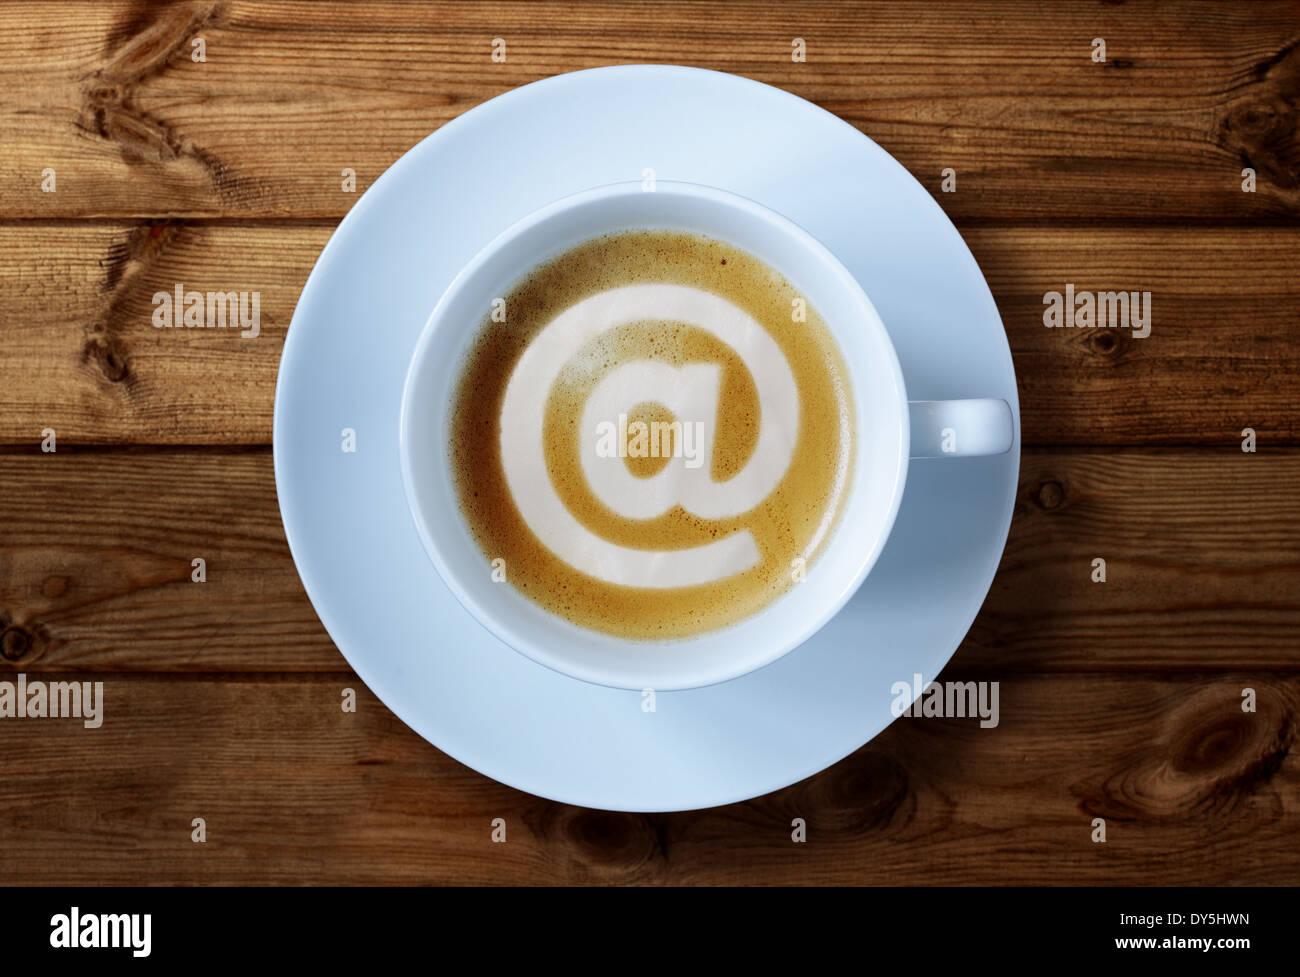 Café Internet Imagen De Stock